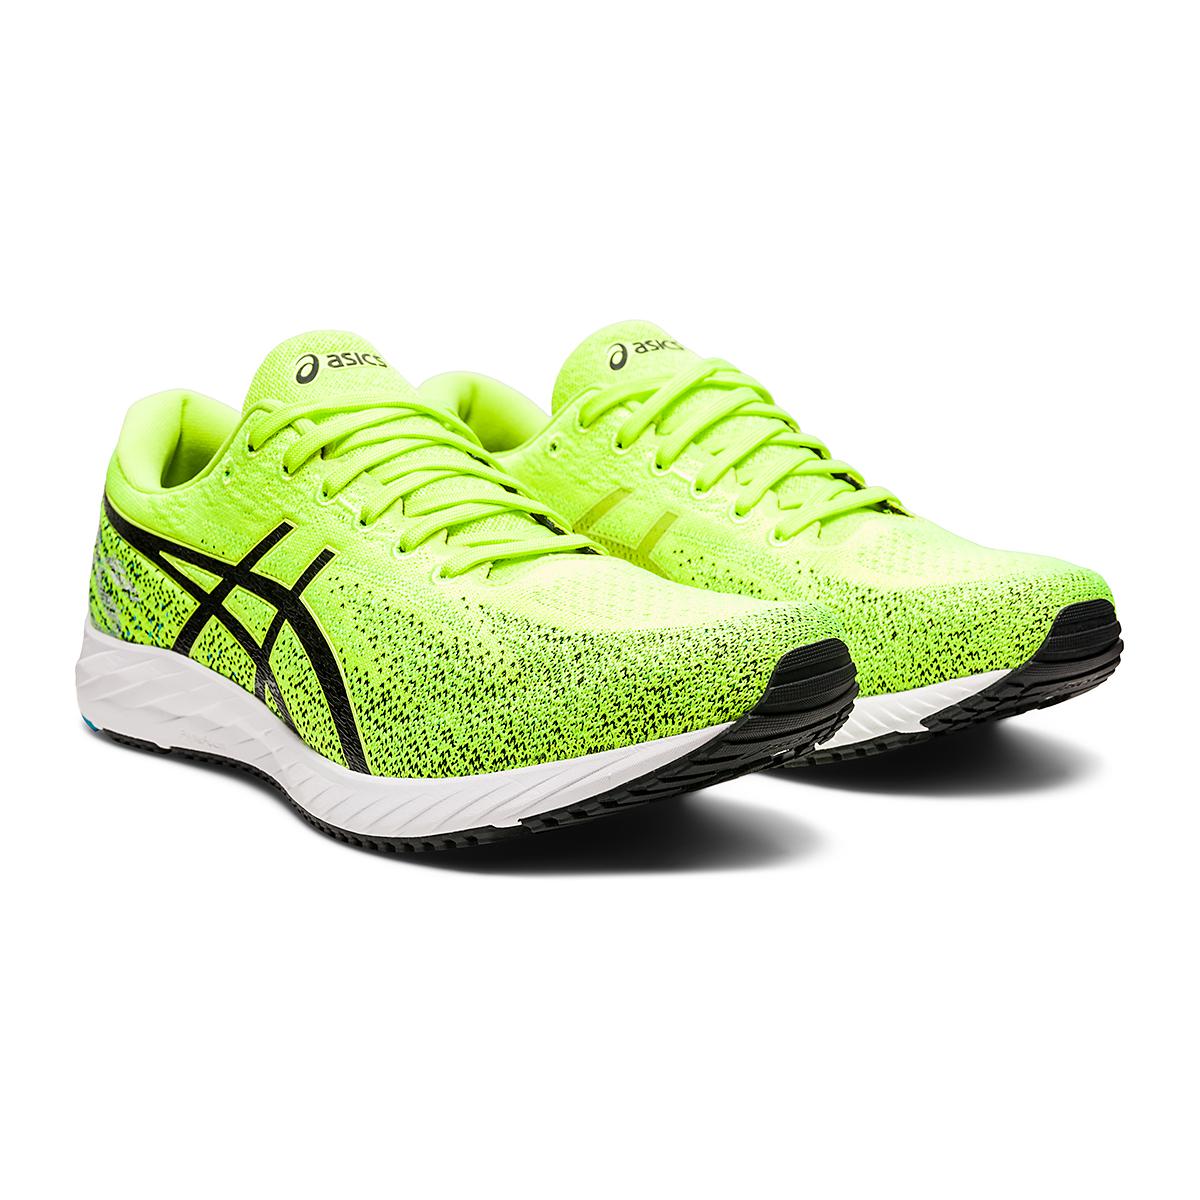 Men's Asics Gel-DS Trainer 26 Running Shoe - Color: Hazard Green/Black - Size: 6 - Width: Regular, Hazard Green/Black, large, image 3